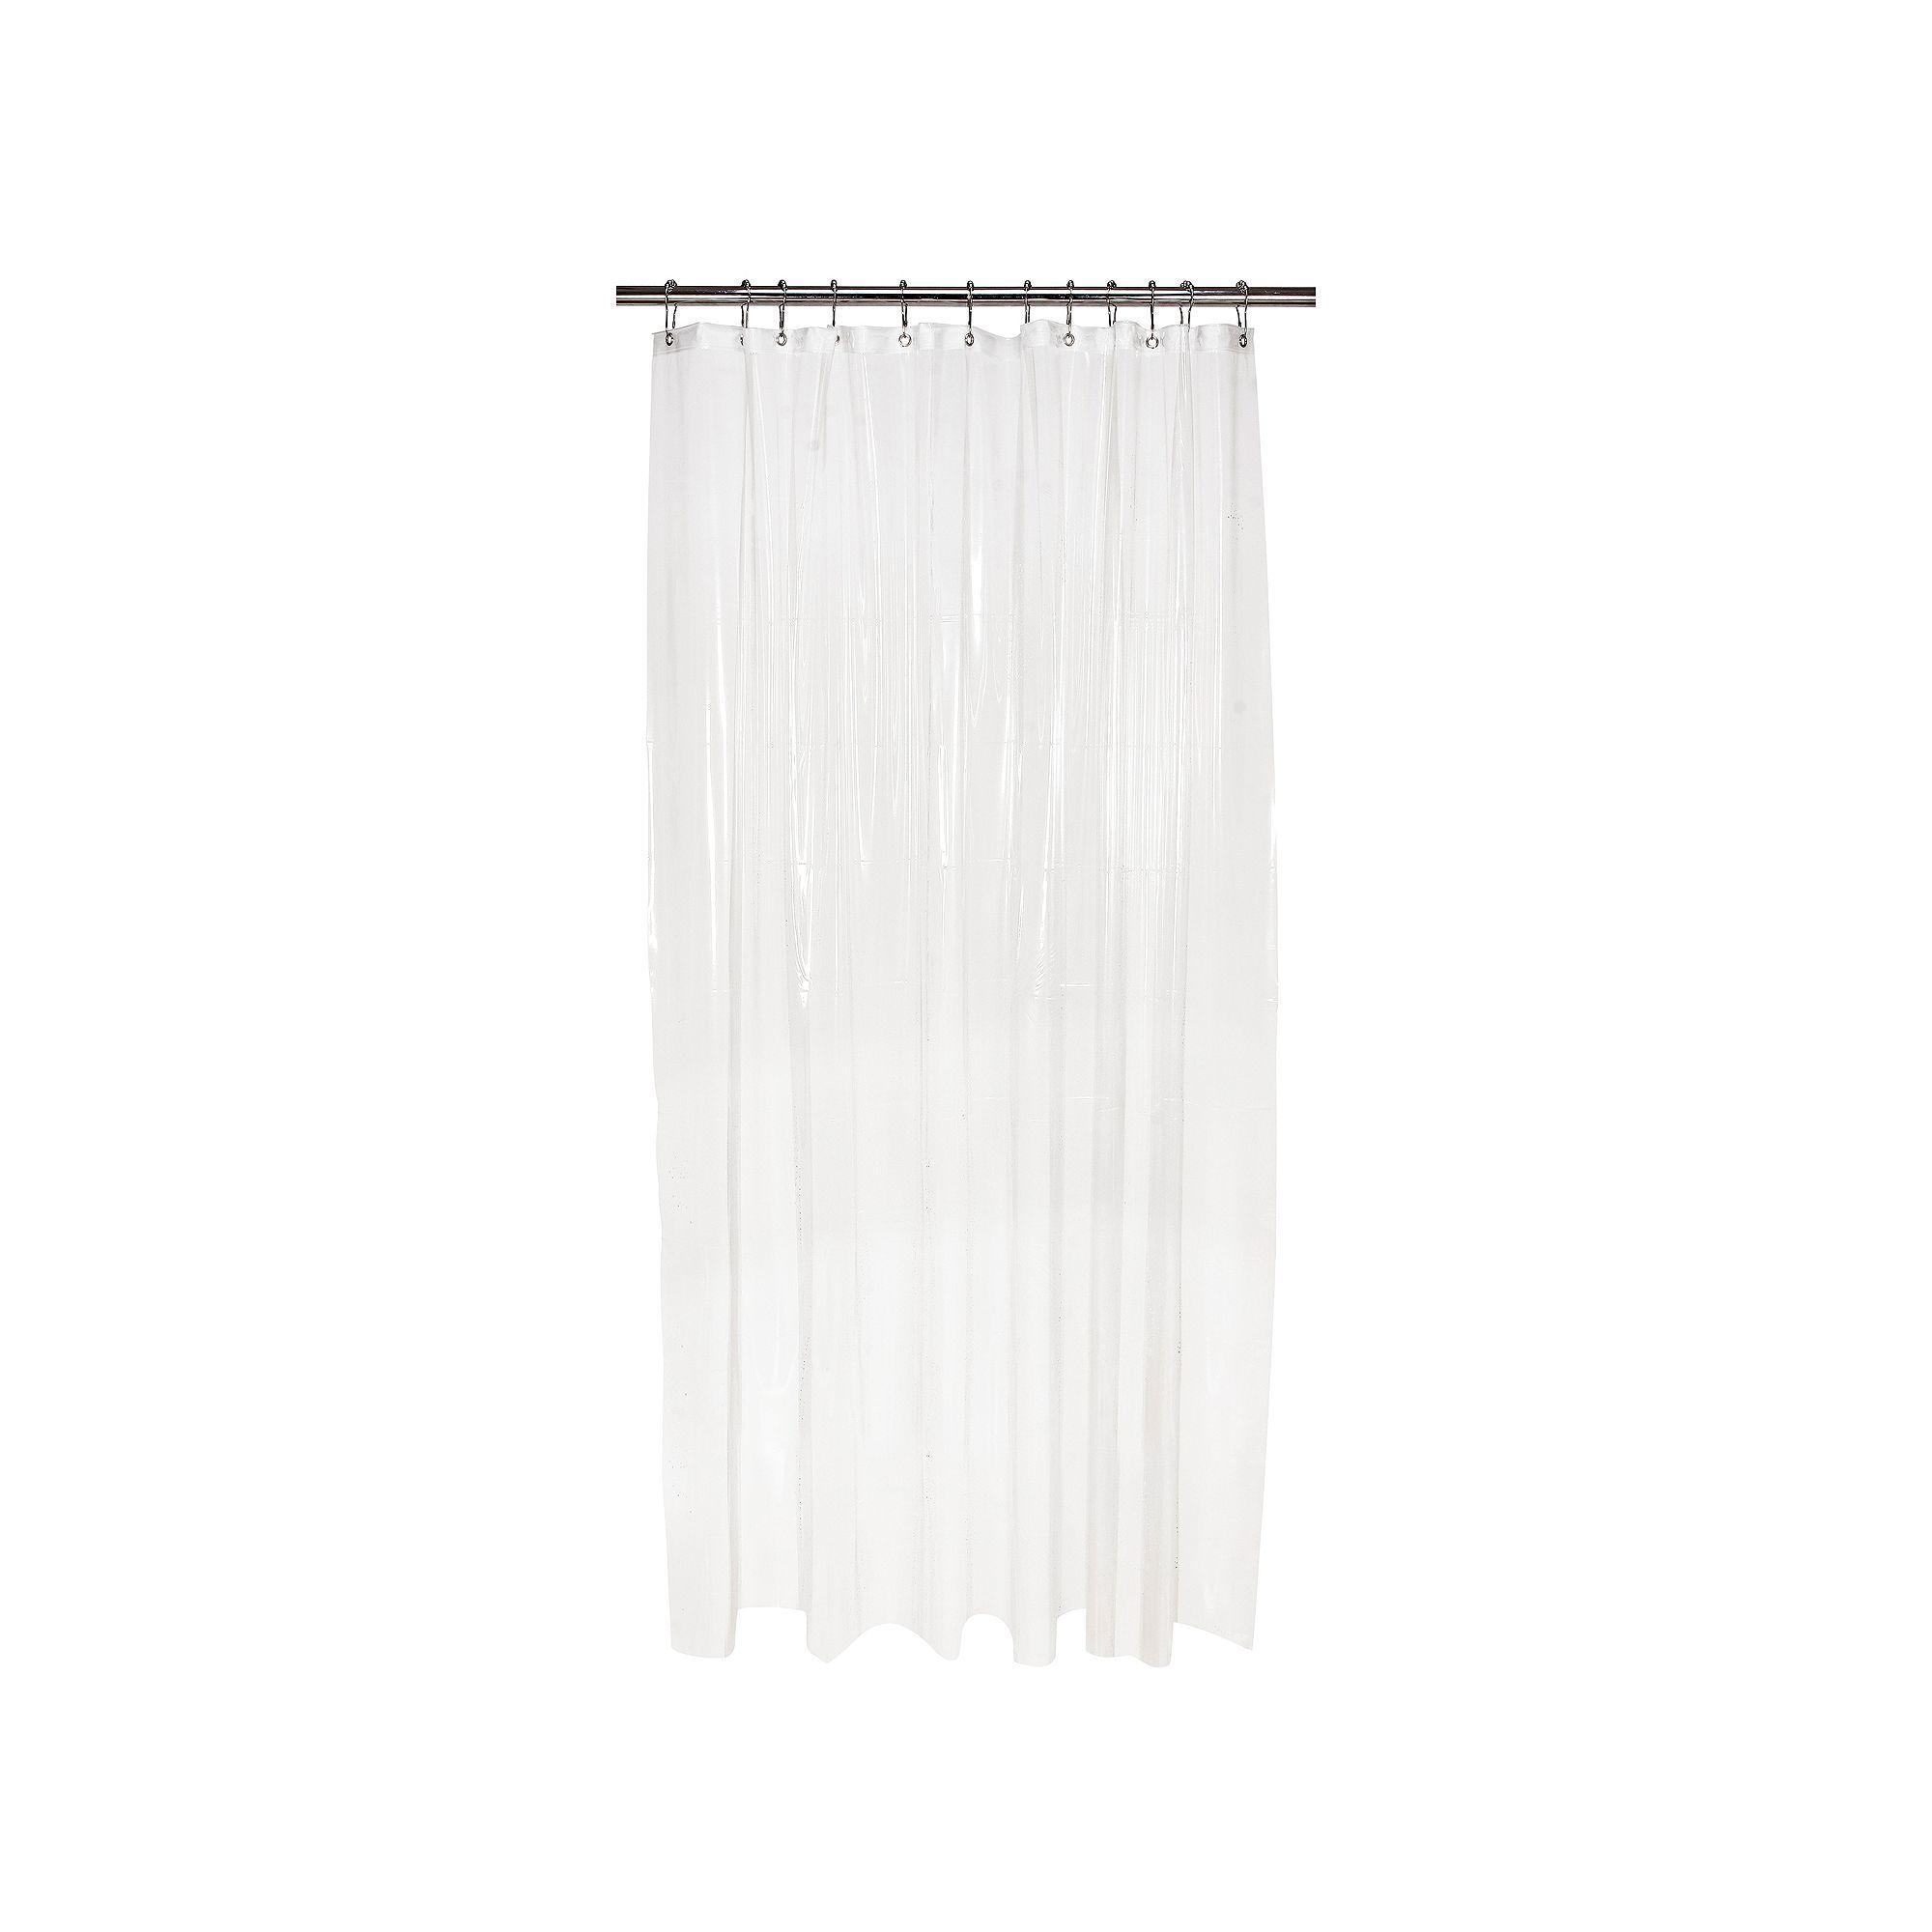 Bath Bliss Mildew Blocker Heavy Gauge Shower Curtain Liner Mold In Bathroom Wall Molding Molding Ceiling